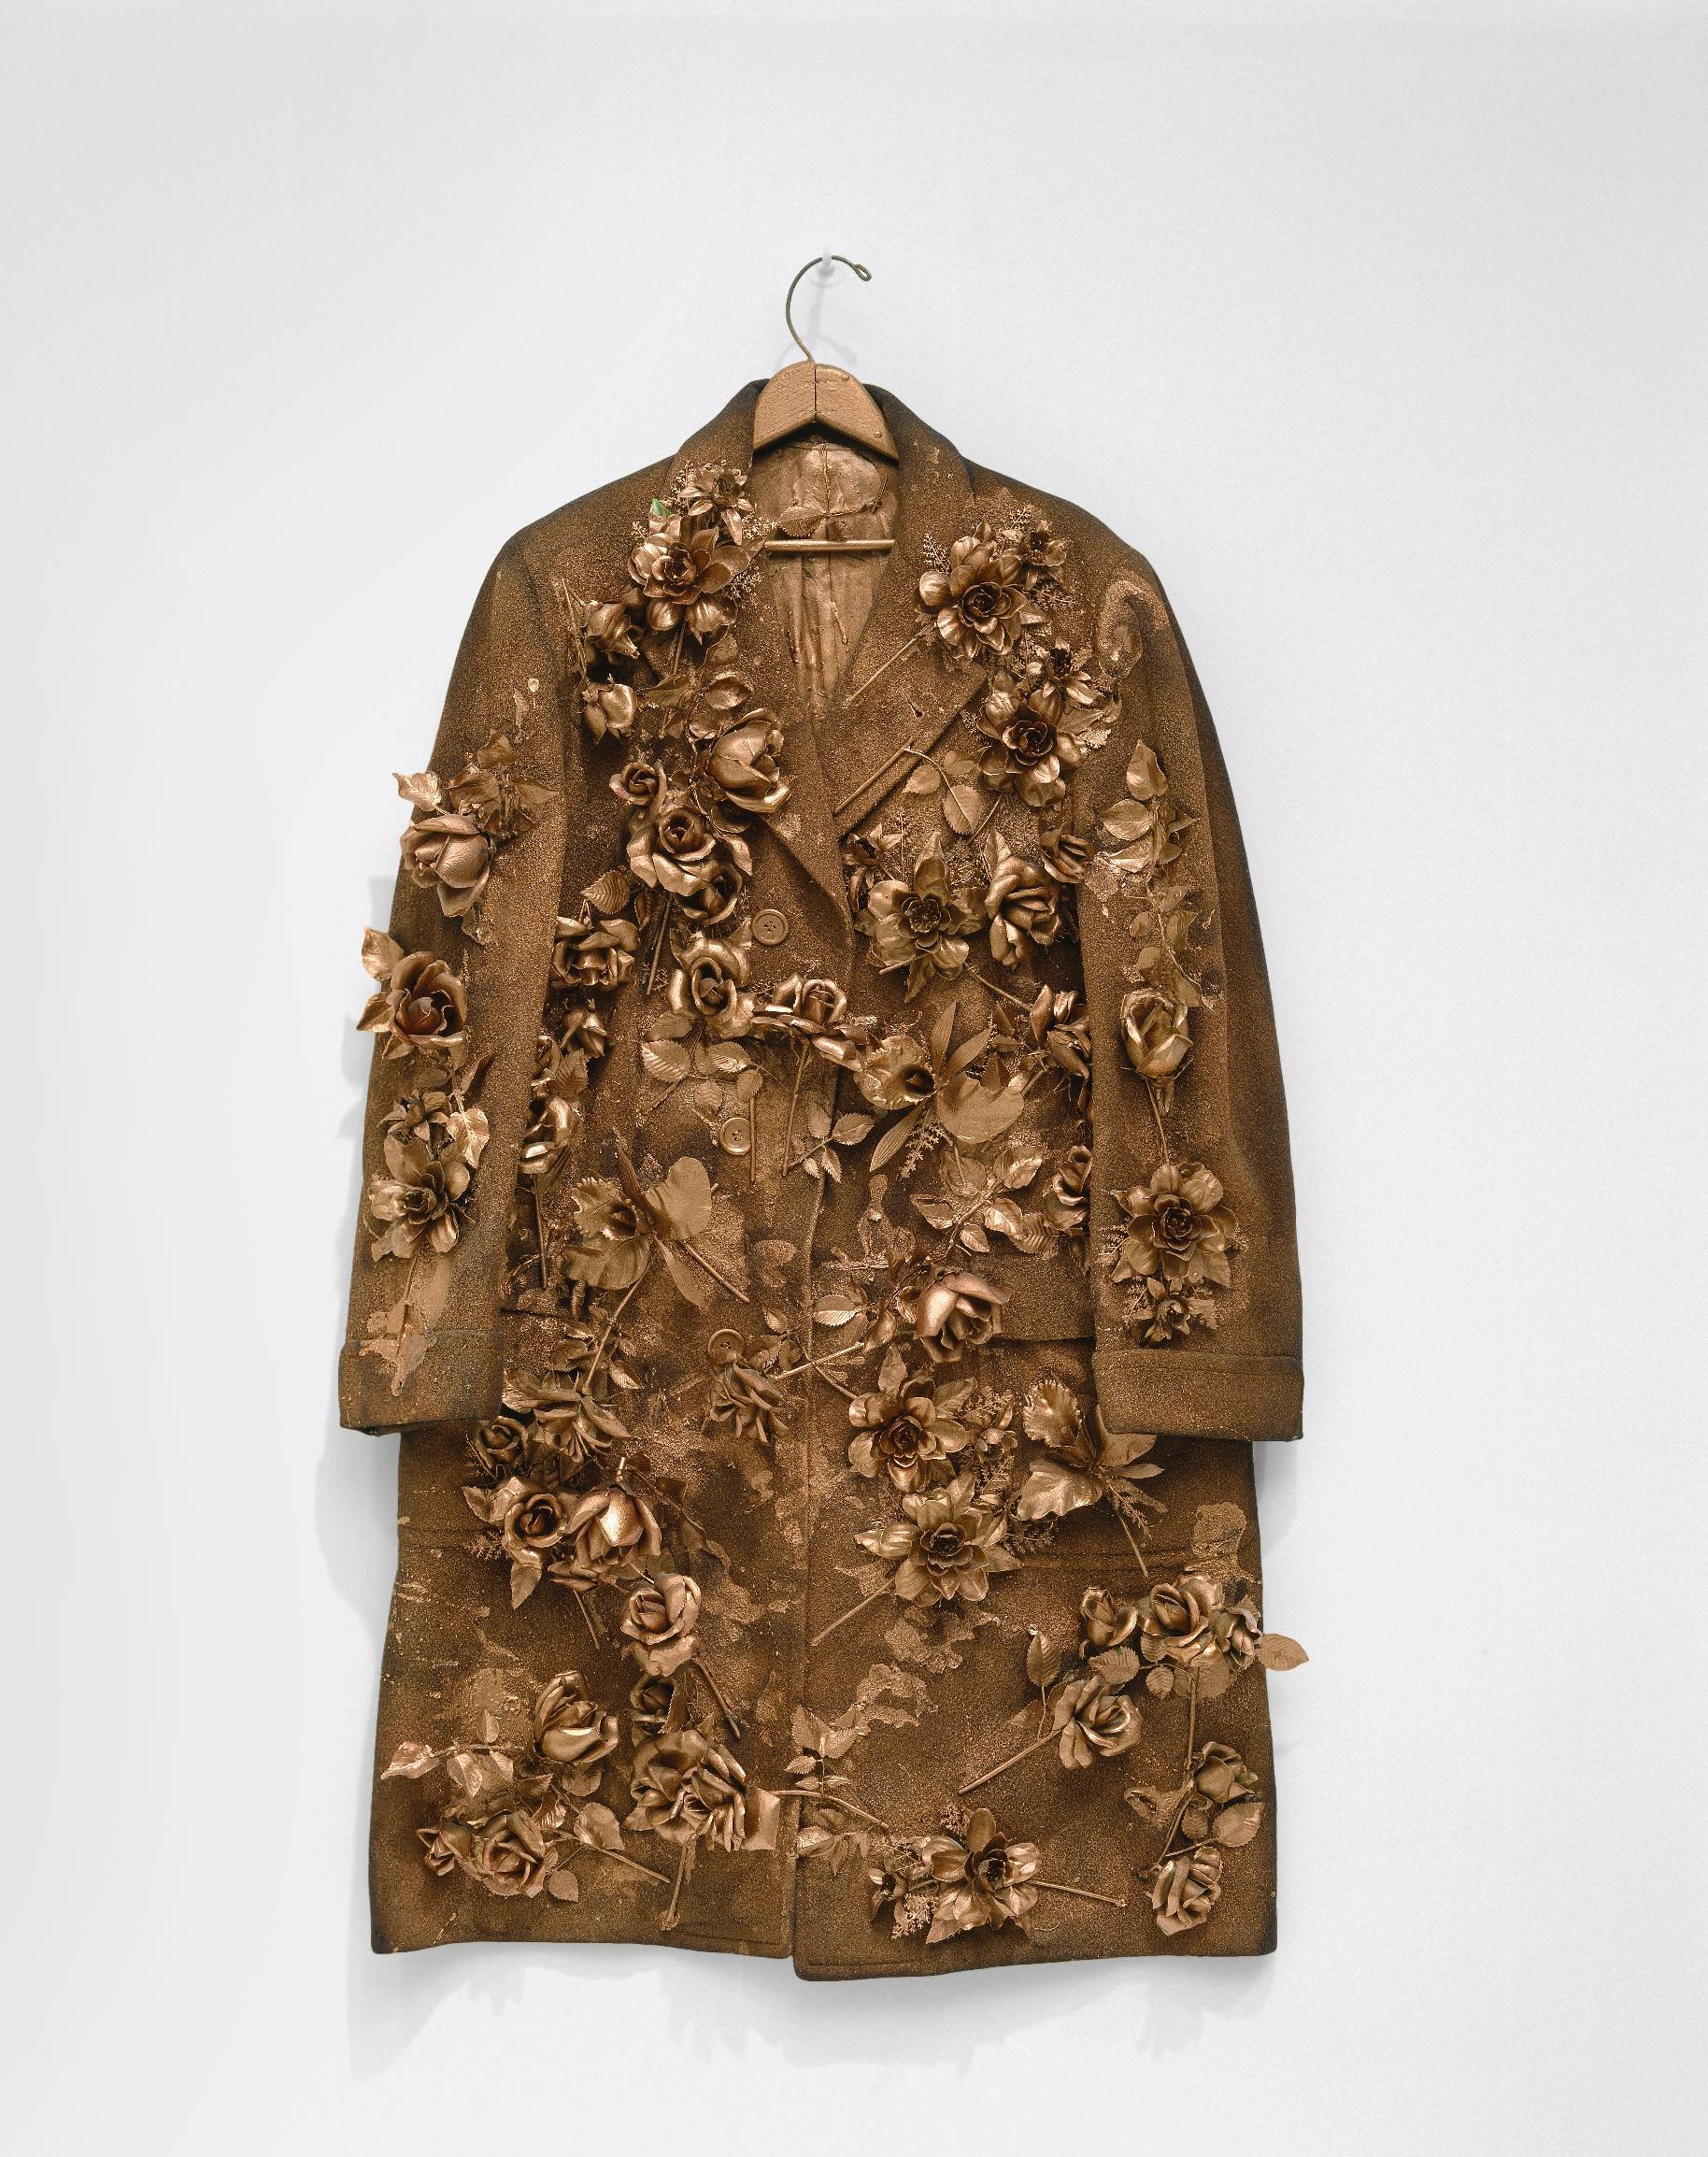 Yayoi Kusama   Flower Overcoat , 1964 (Cloth overcoat, plastic flowers, metallic paint, and wood hanger) Hirshhorn Museum and Sculpture Garden, Washington, DC. Joseph H. Hirshhorn Bequest and Purchase Funds, 1998 (98.38). © Yayoi Kusama Photo credit: Lee Stalsworth